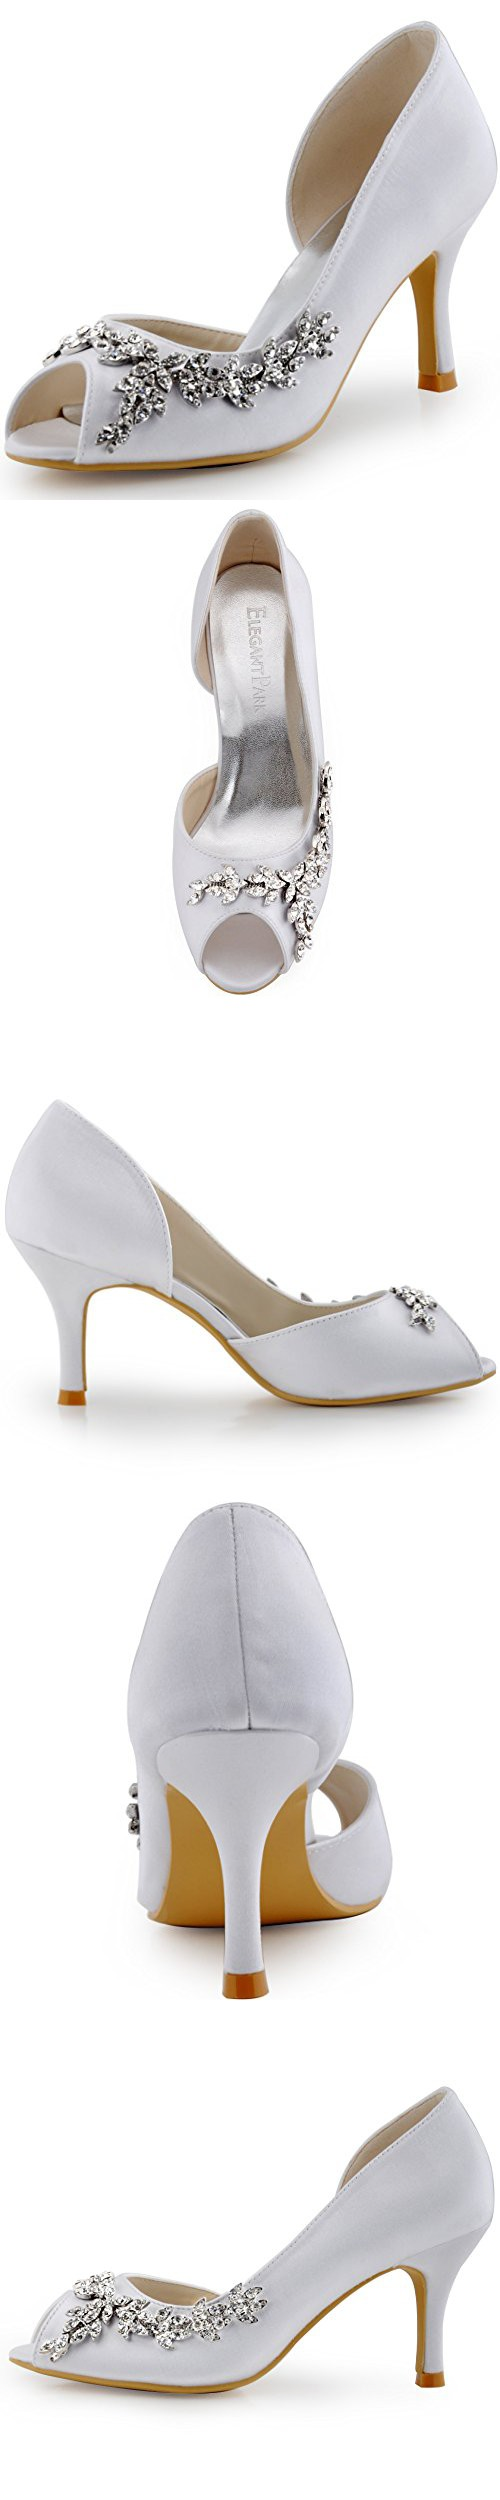 d998eb288933 ElegantPark HP1542 Women Peep Toe Rhinestones Pumps High Heel Satin Wedding  Bridal Dress Shoes White US 11